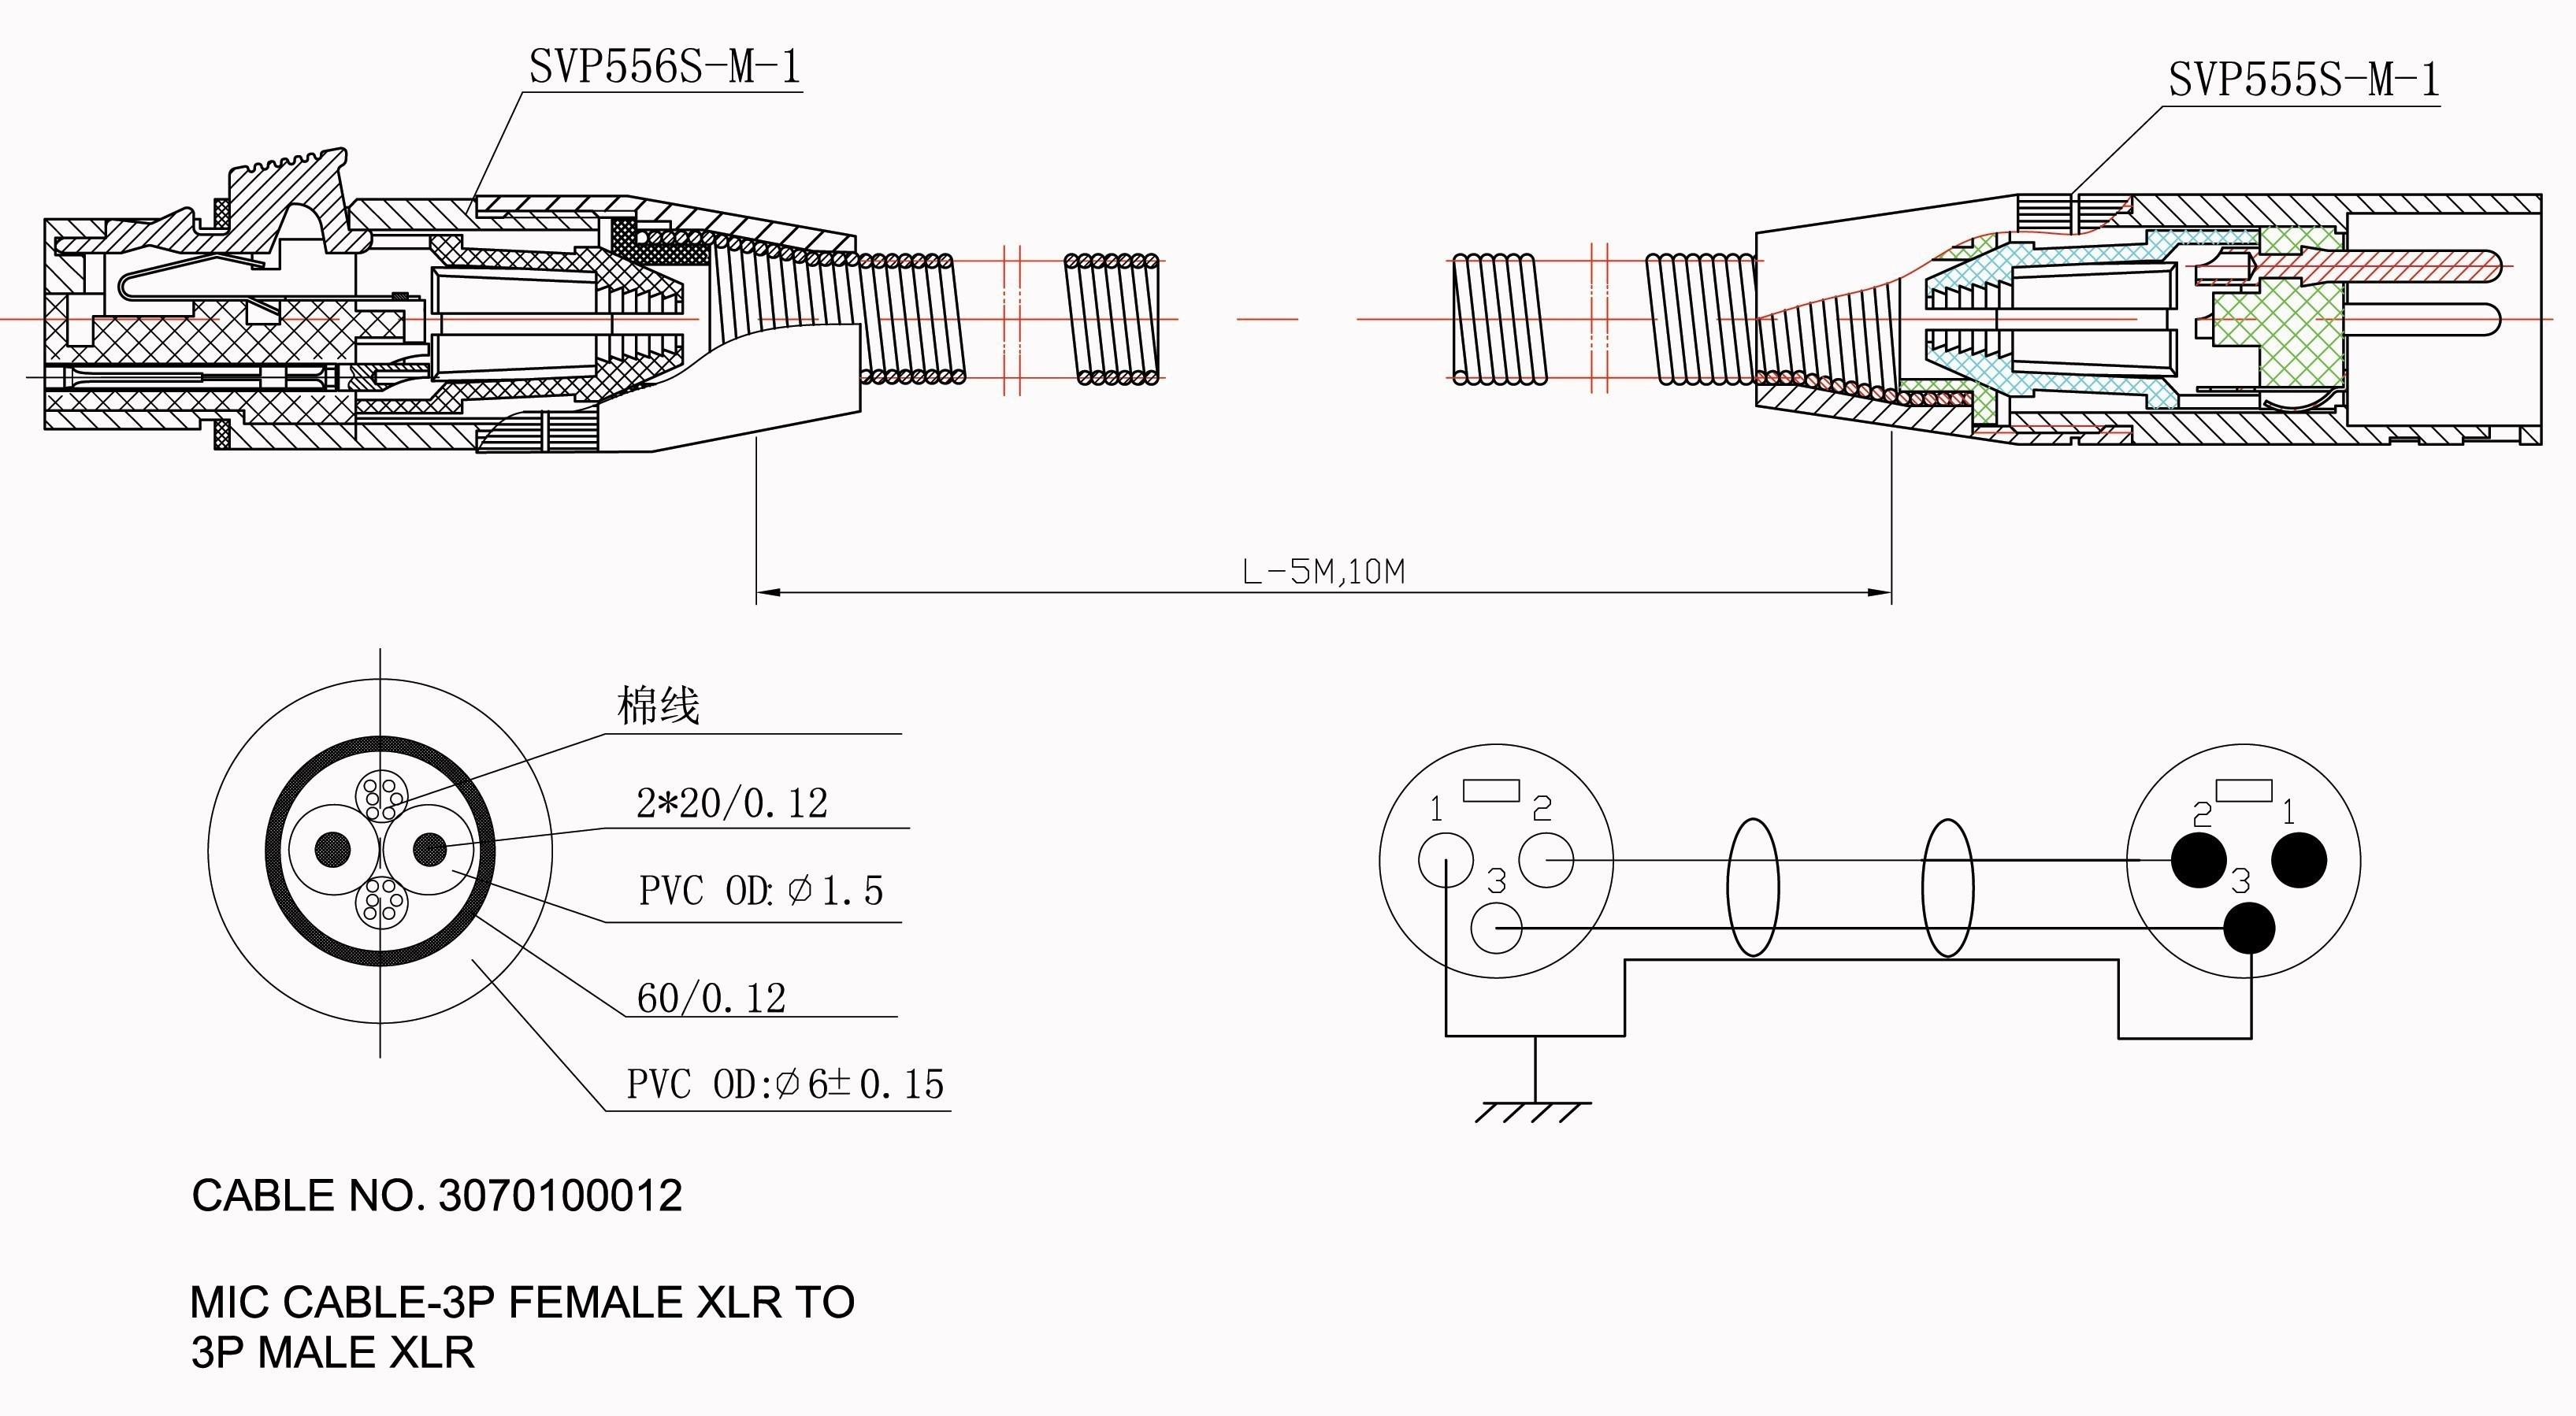 Motorcycle Engine Diagram Honda Beat Motorcycle Wiring Diagram Valid Big Dog Wiring Diagram Of Motorcycle Engine Diagram